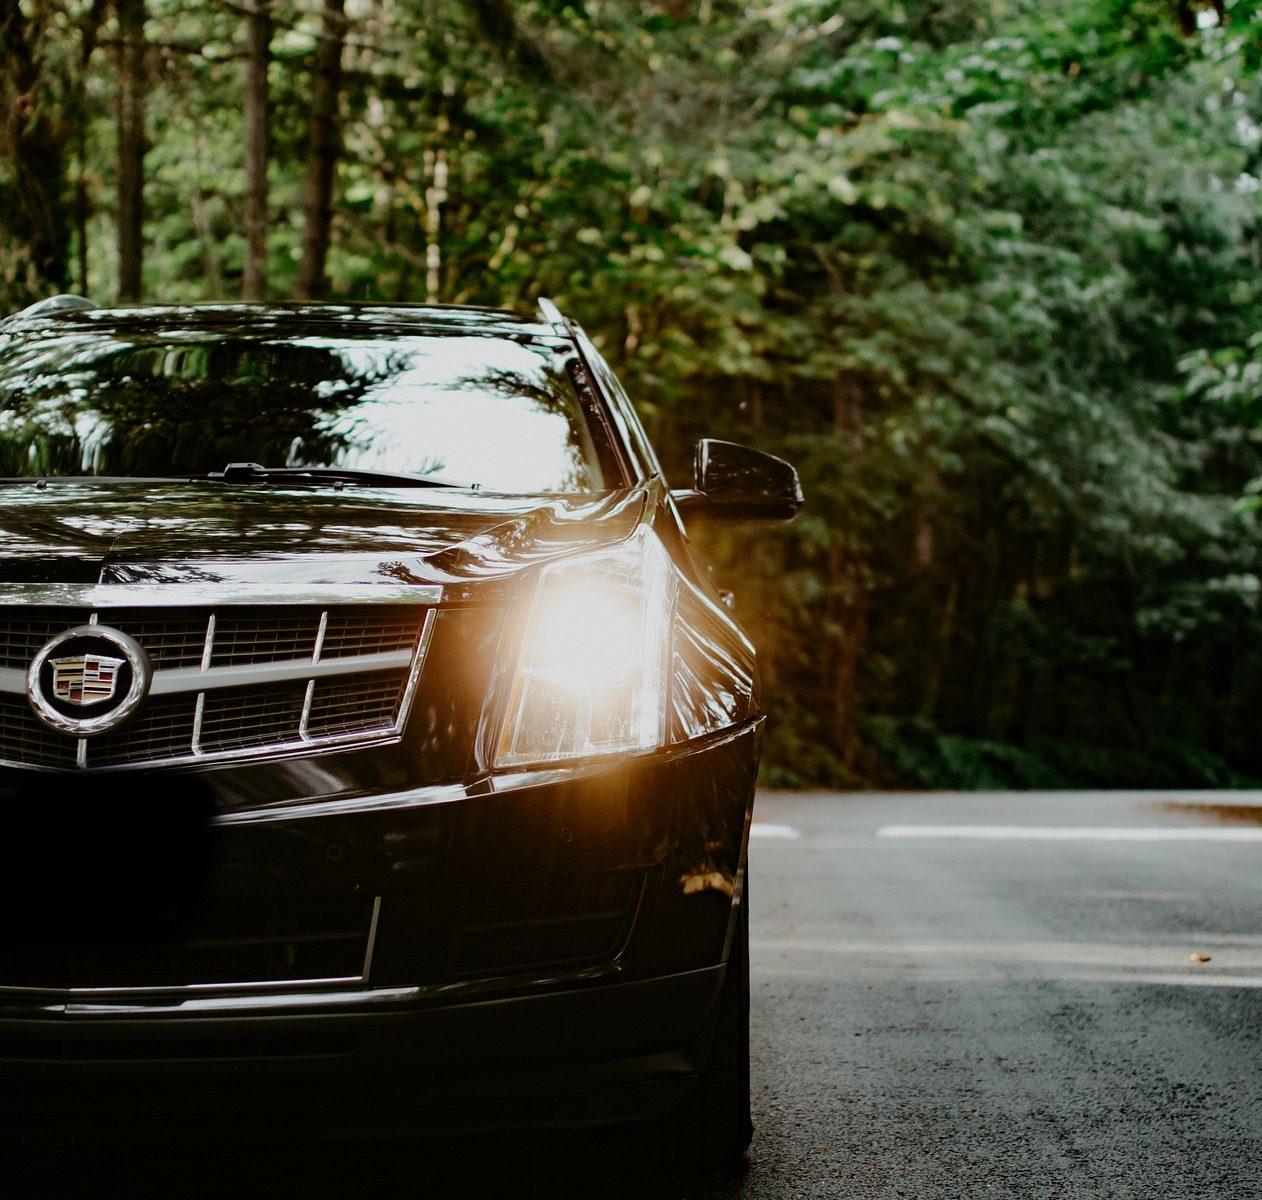 Image of Cadillac